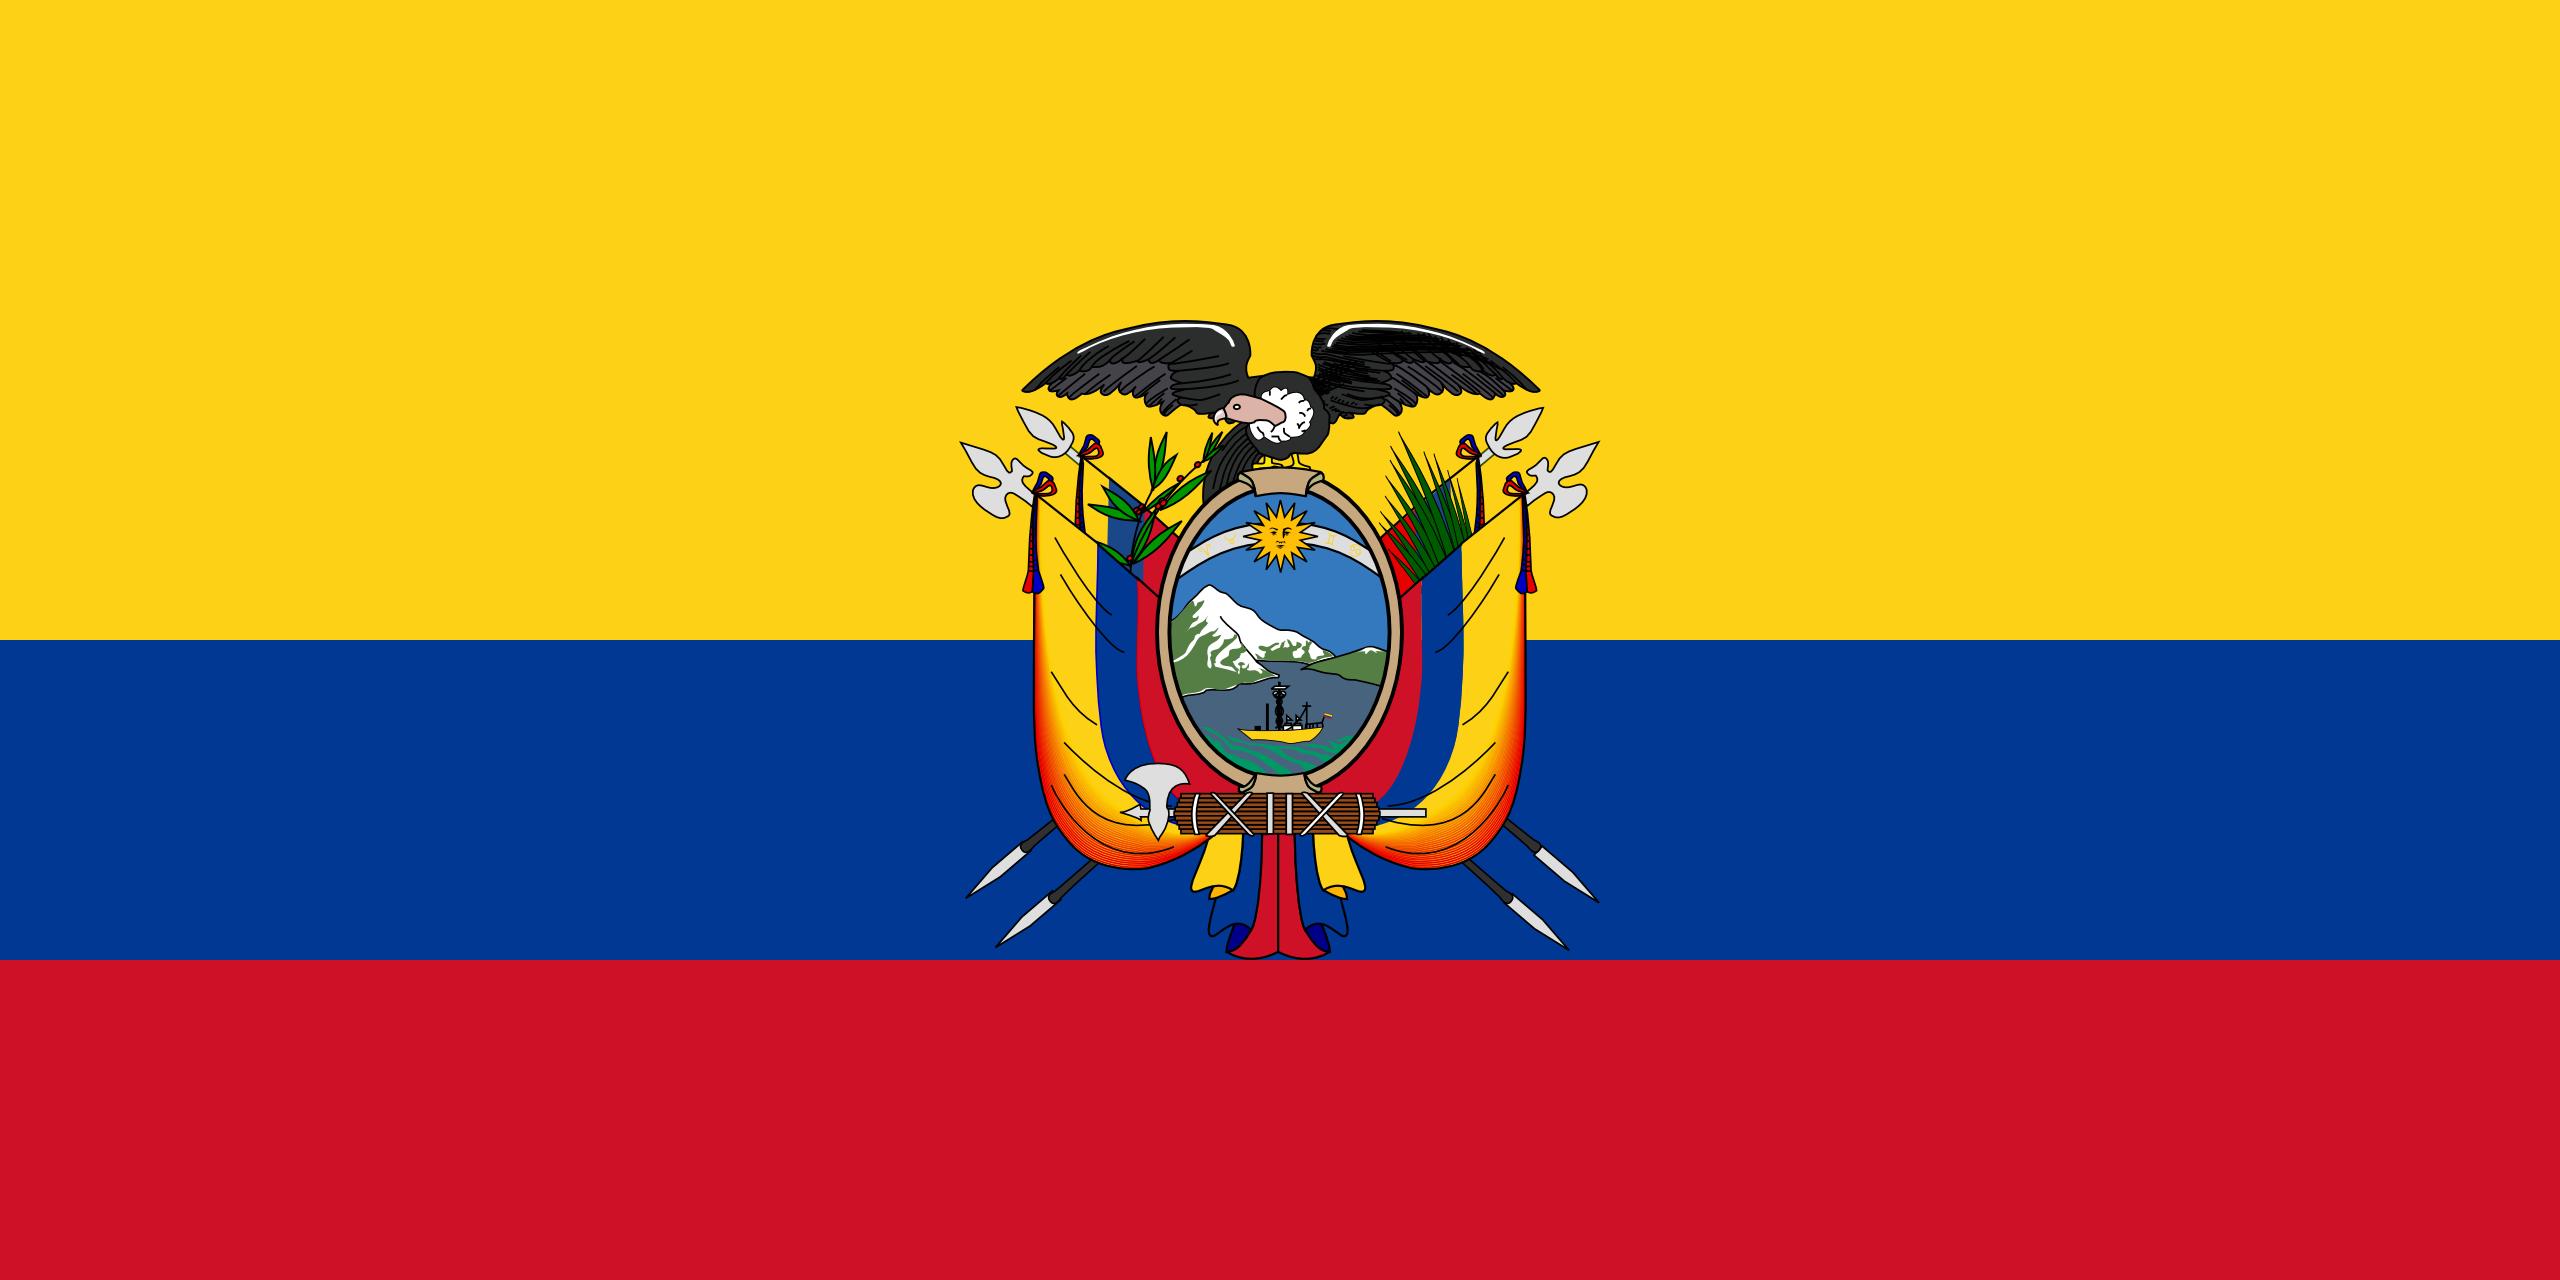 ecuador, χώρα, έμβλημα, λογότυπο, σύμβολο - Wallpapers HD - Professor-falken.com